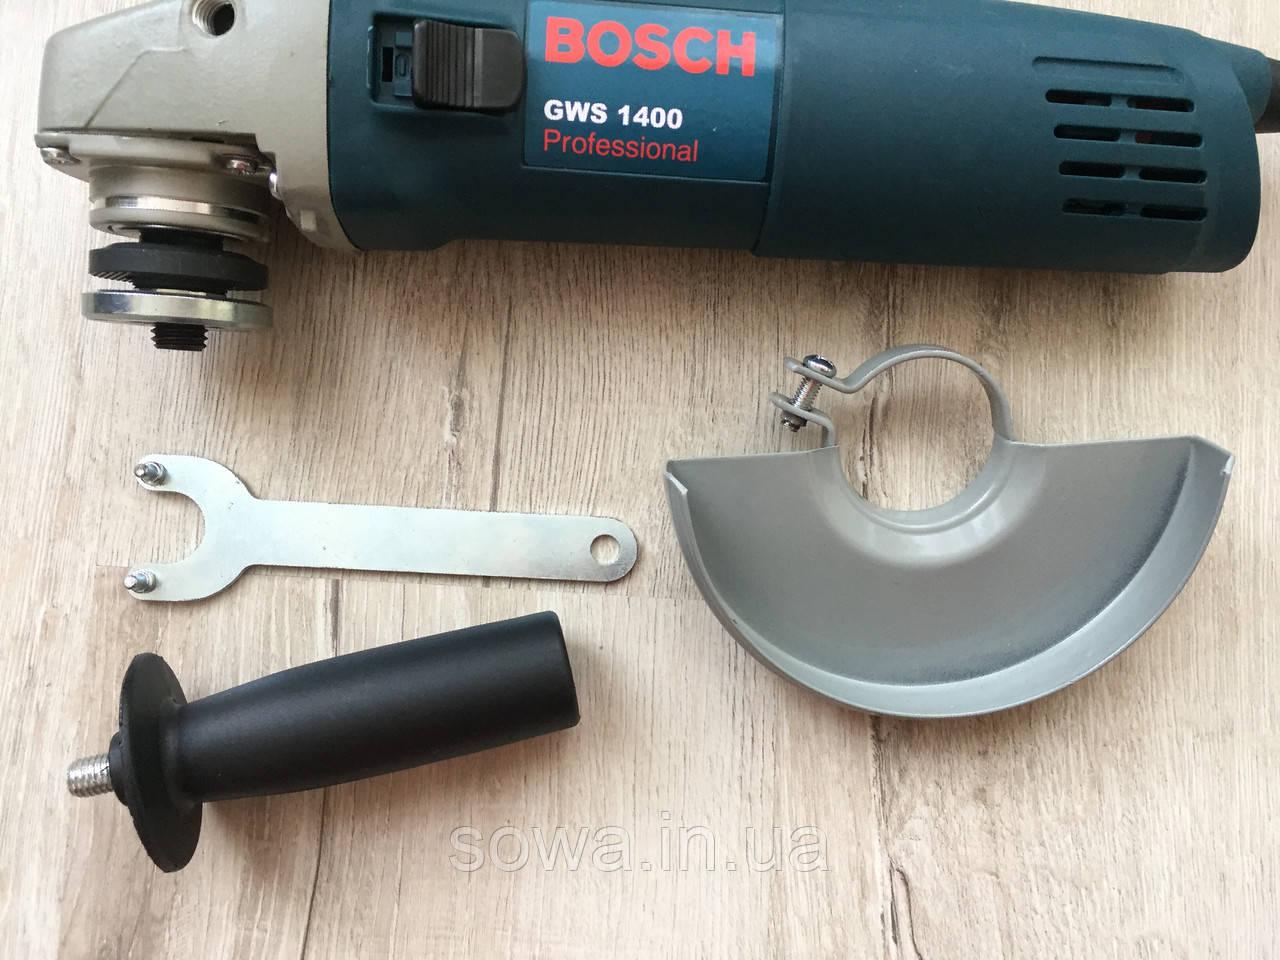 Болгарка BOSCH_ БОШ GWS1400 ( 1400 Вт, 125 мм ) + ПОДАРОК - фото 5